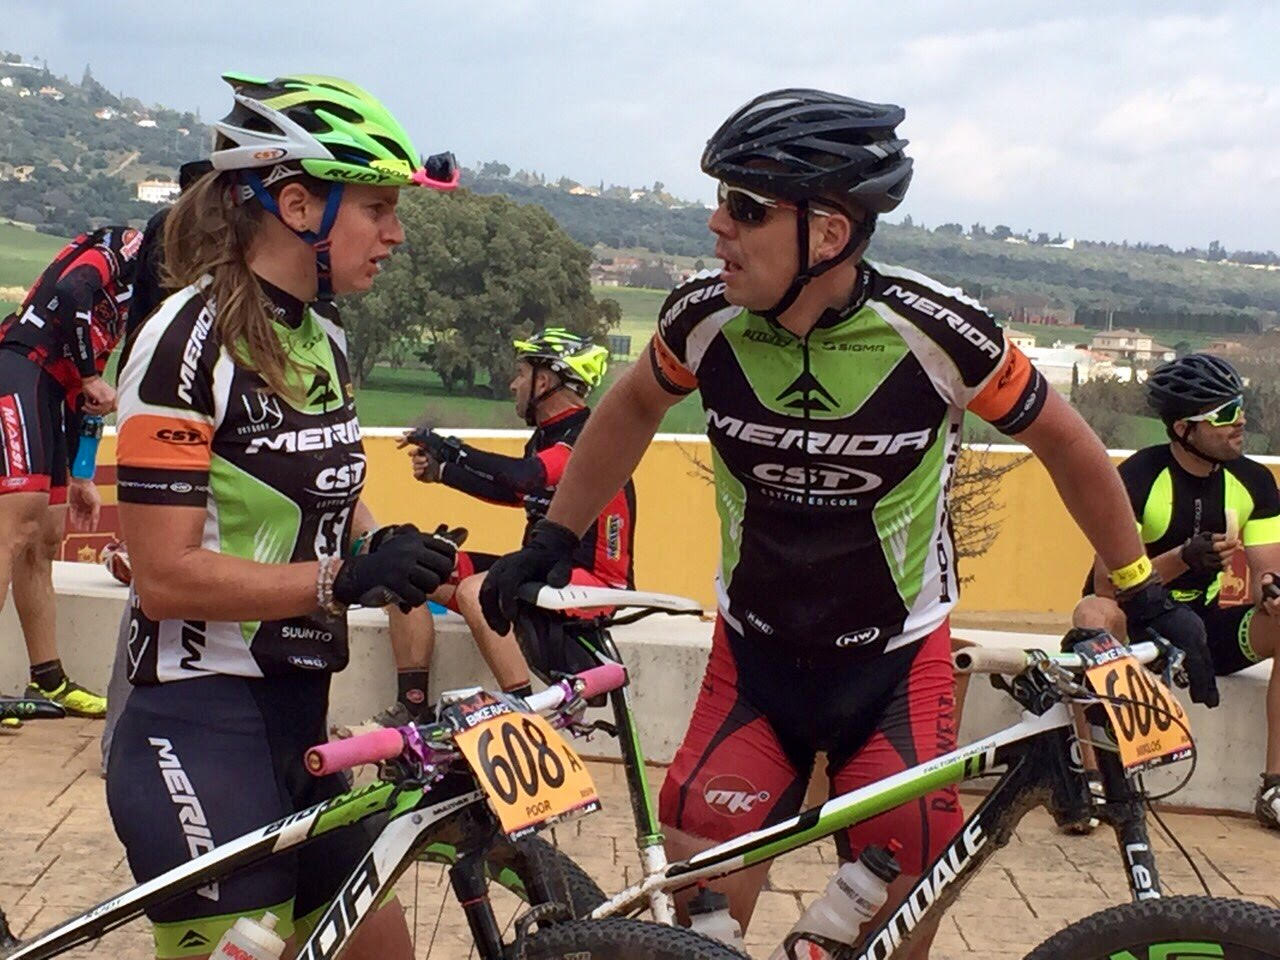 andalucia_bike_race_02